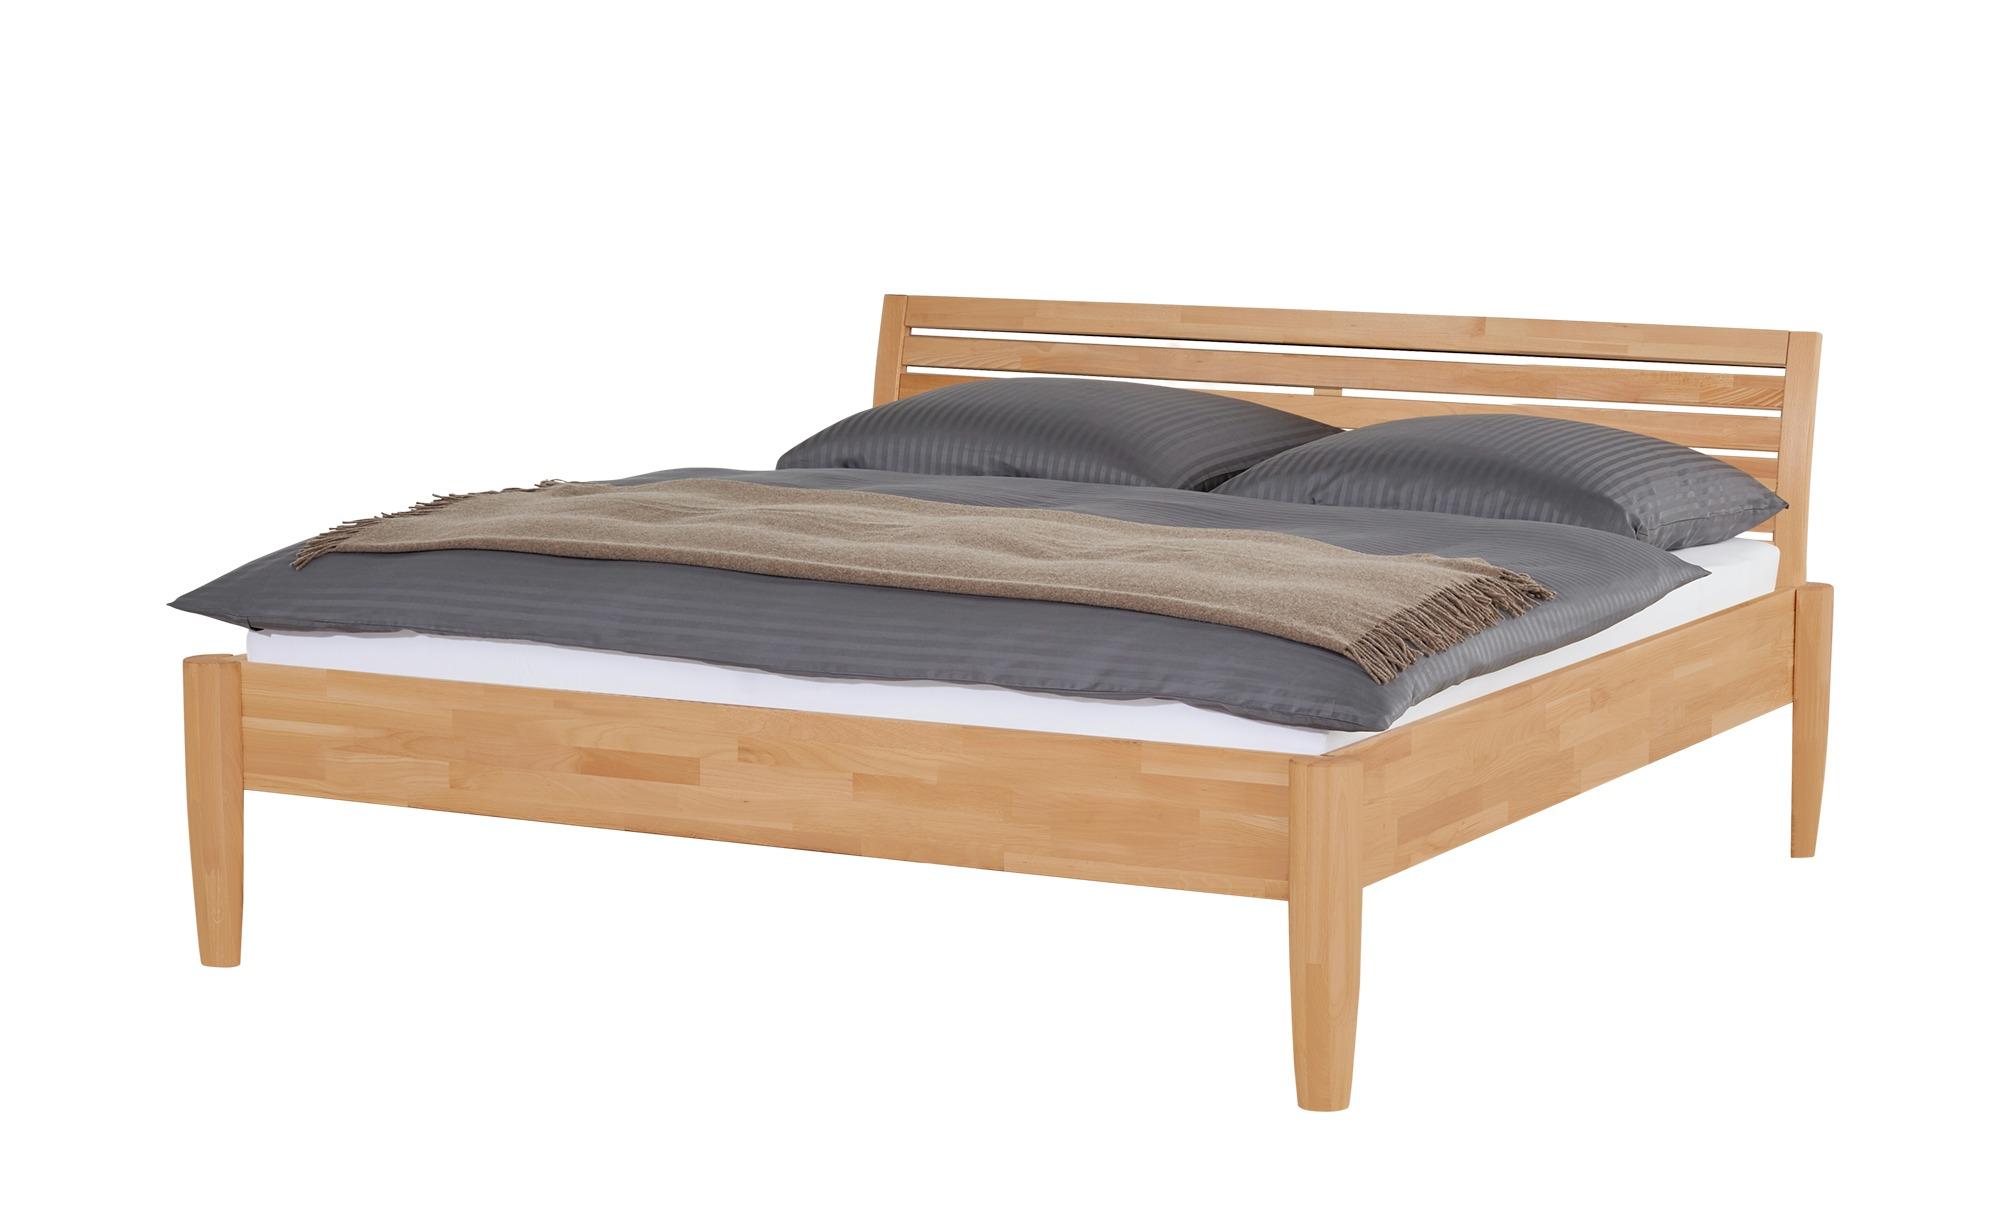 Massivholz-Bettgestell  Timber ¦ holzfarben ¦ Maße (cm): B: 196 H: 93 Betten > Futonbetten - Höffner